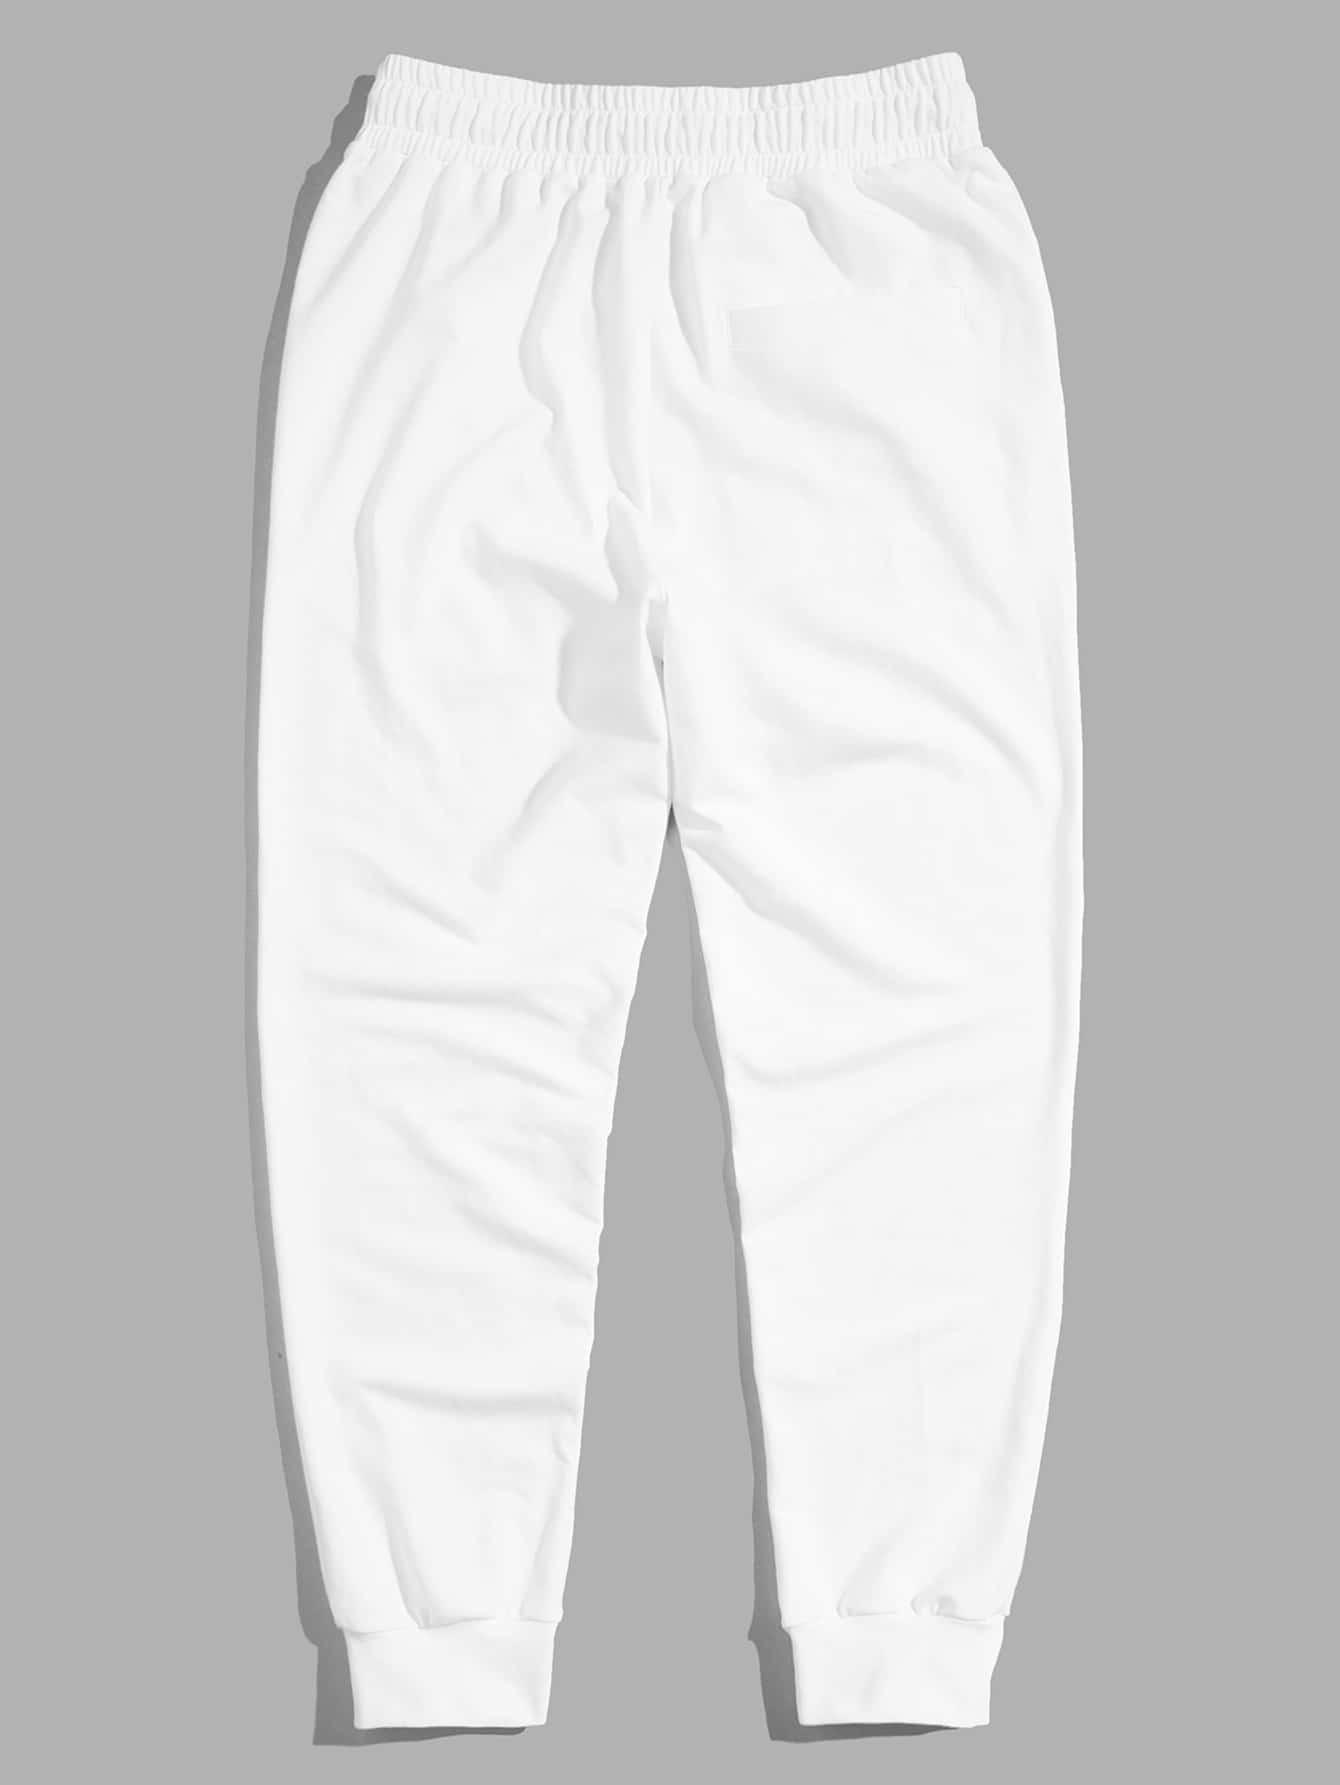 Etecredpow Boys Drawstring Slim Elastic Wasit Casual Jogger Pants Athletic Pants Navy Blue 14//16